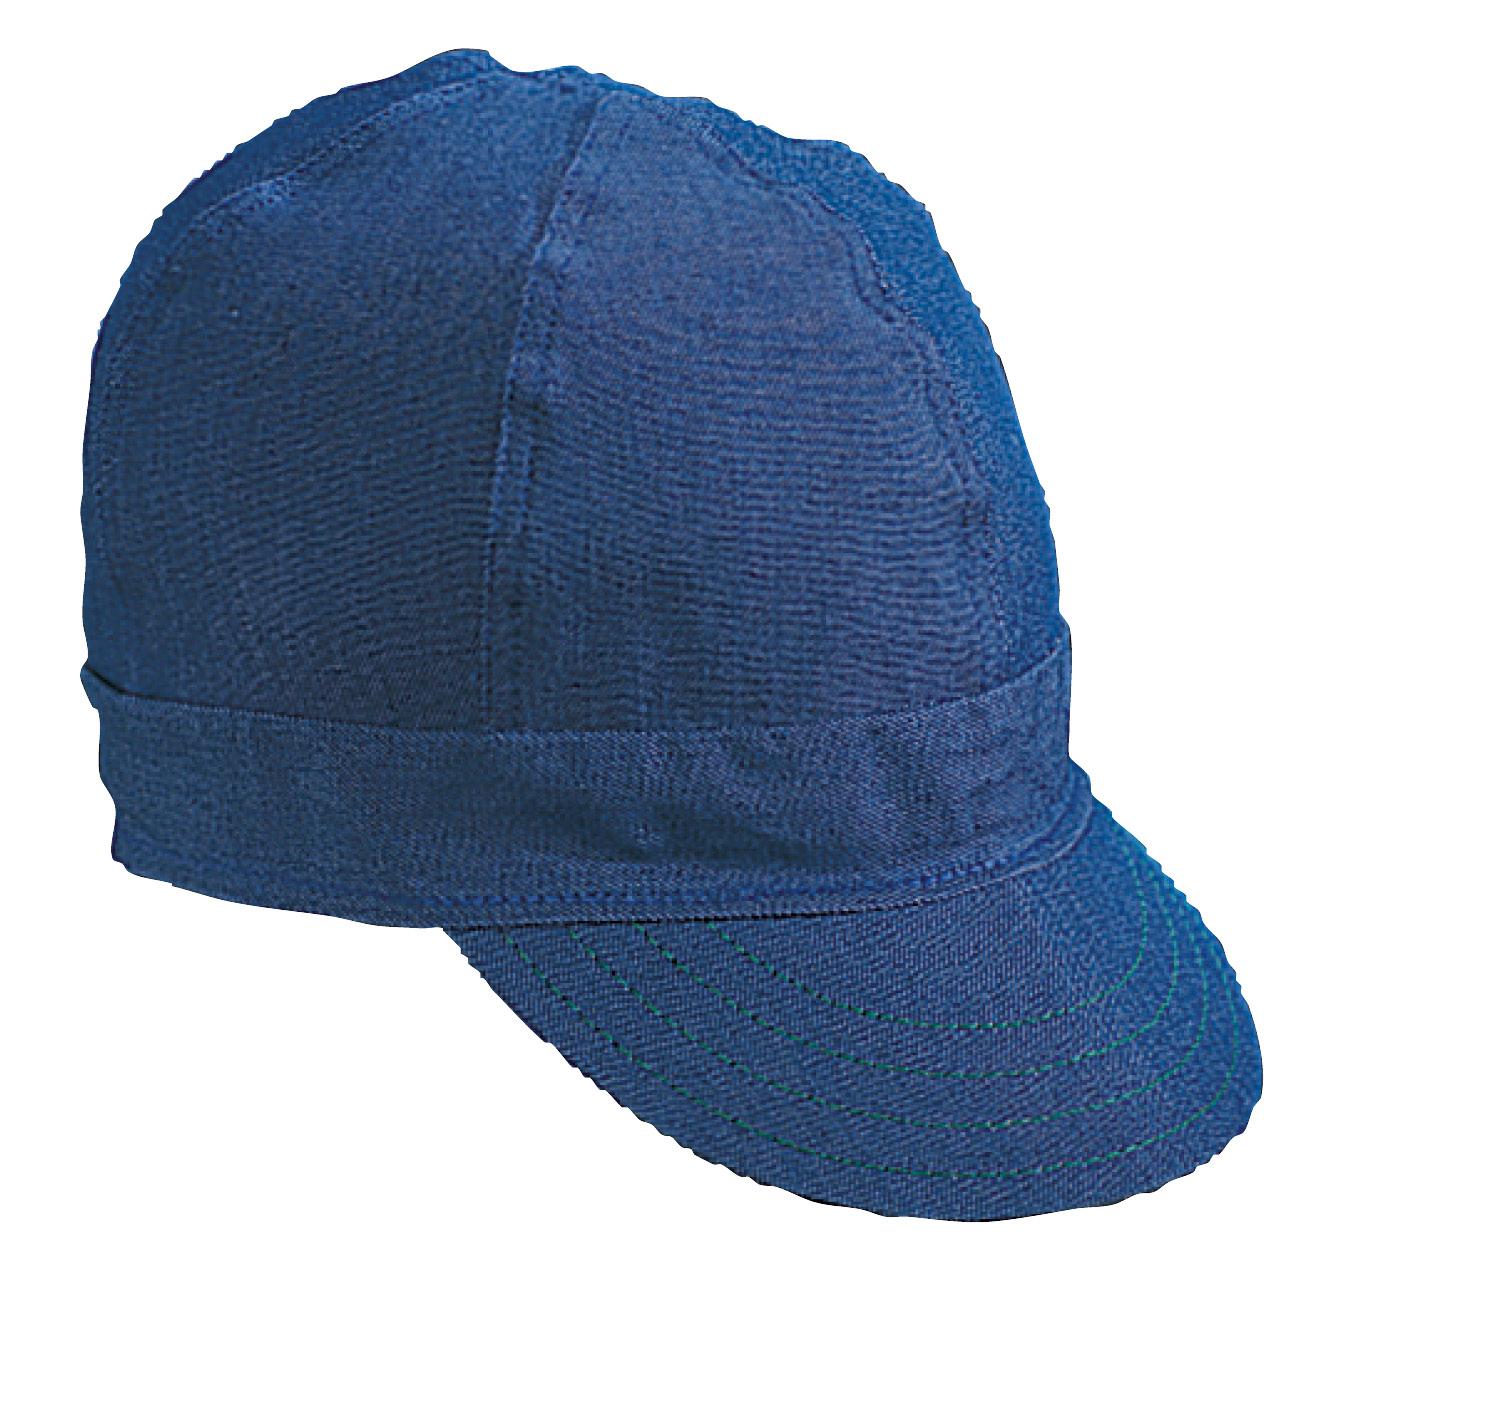 "Kromer Blue Denim Style Welder Cap, Cotton, Length 5"", Width 6"""